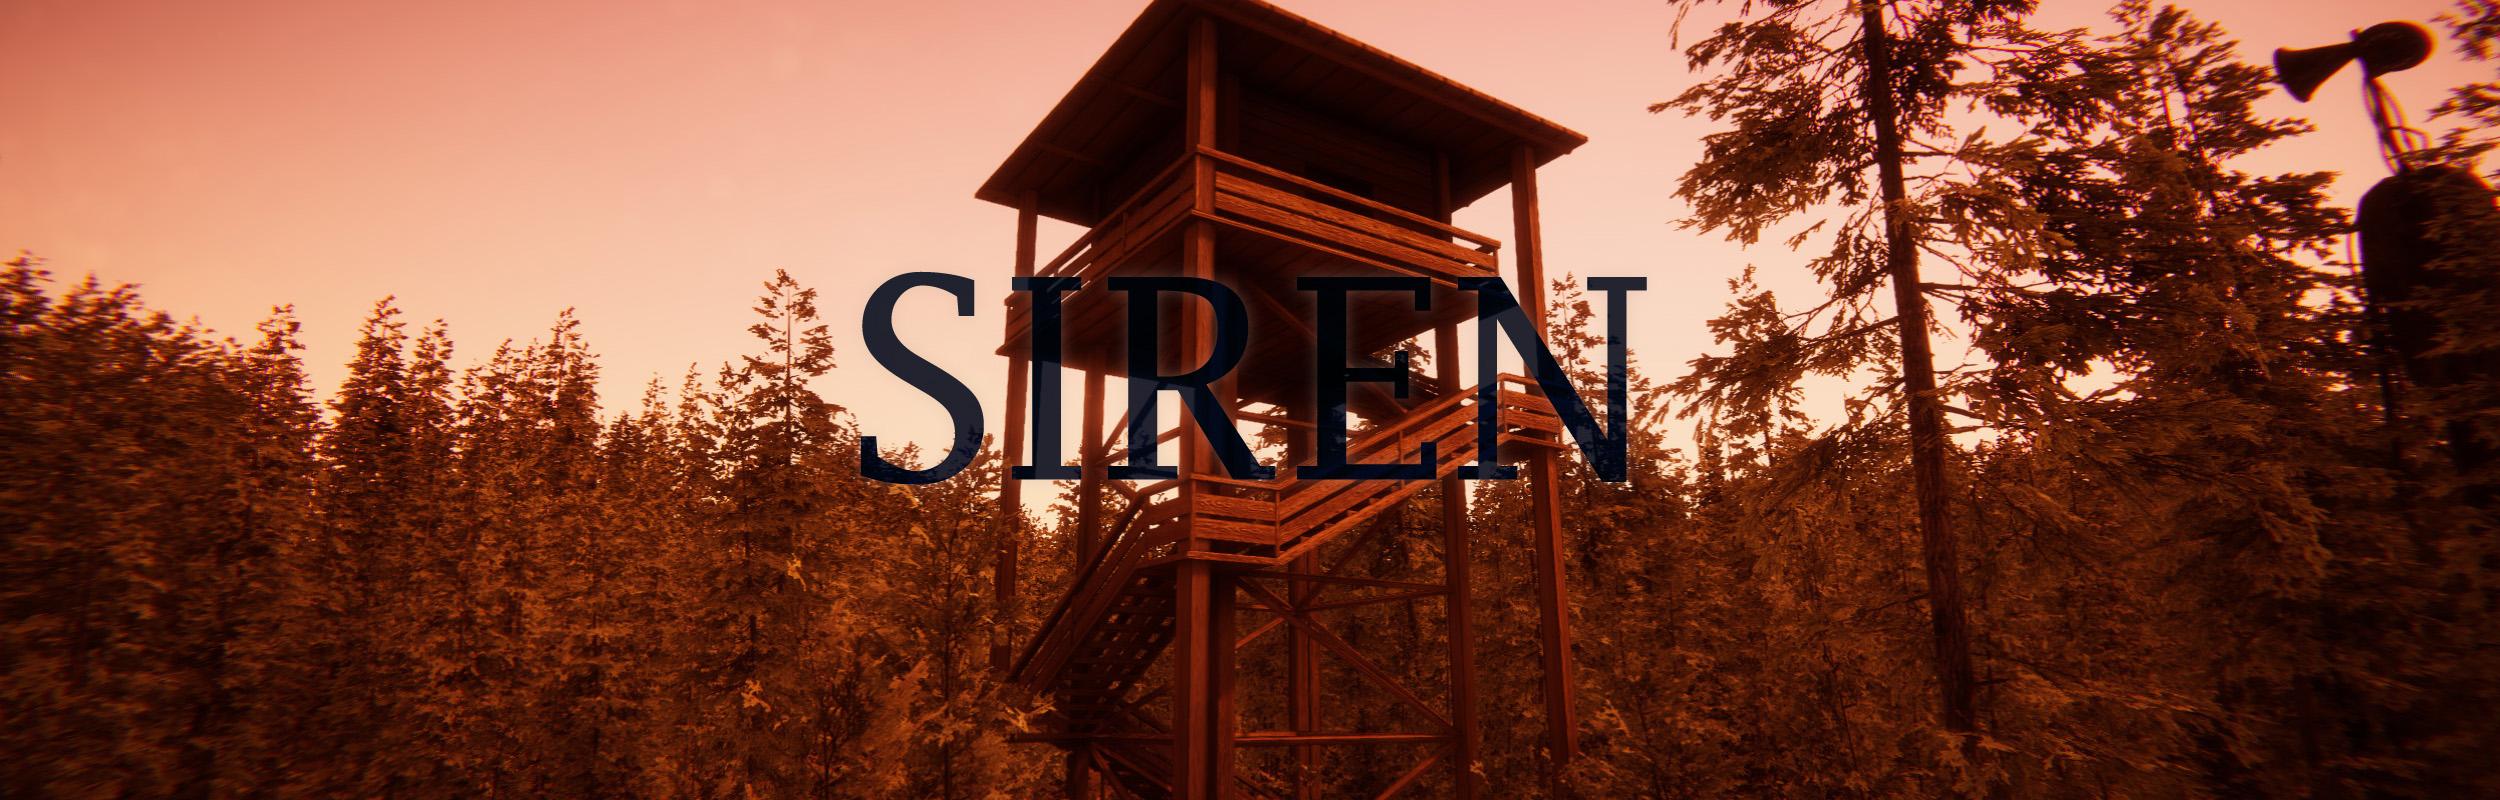 SIREN - A Siren Head experience